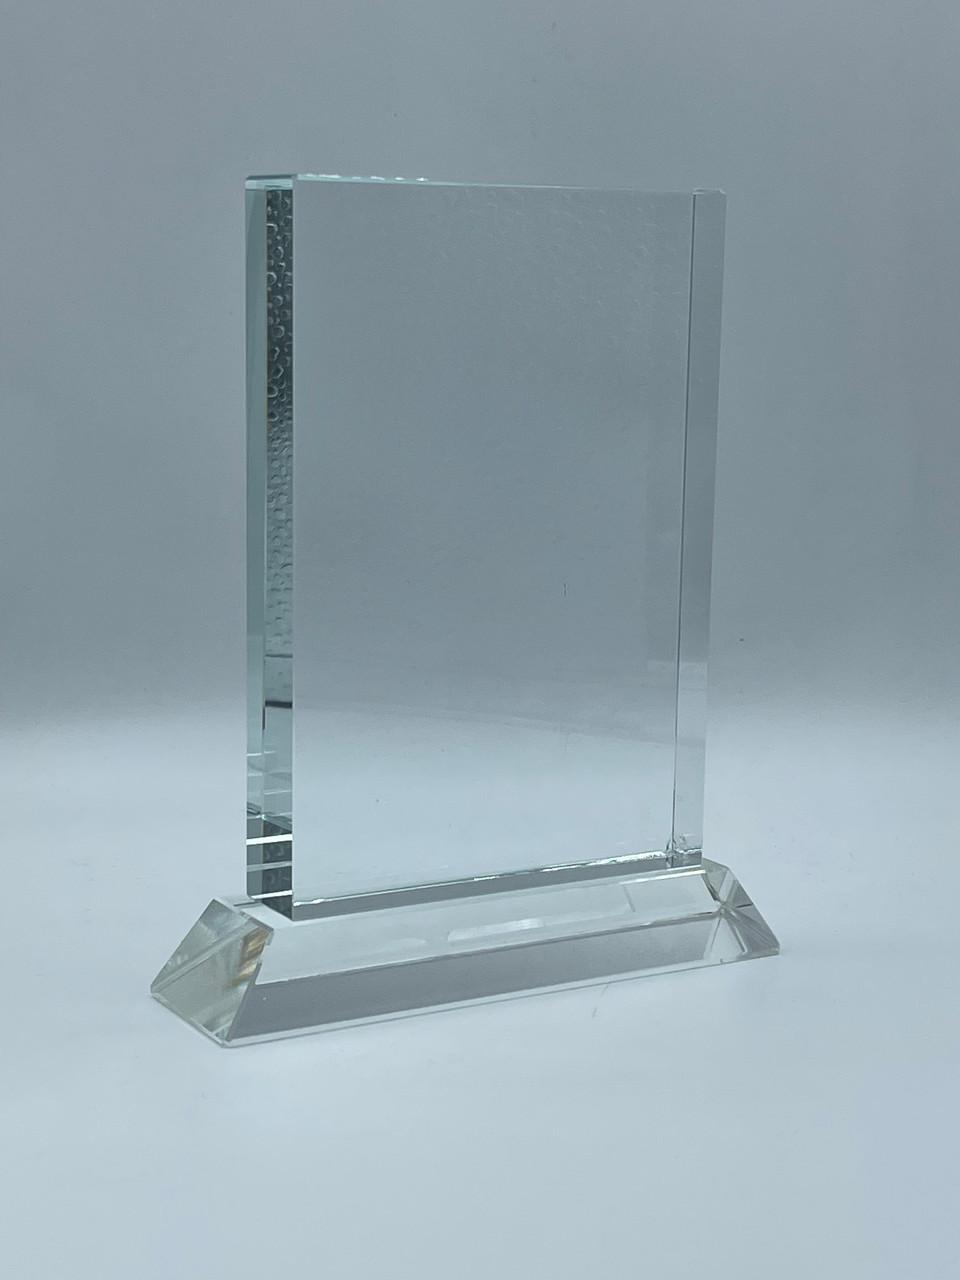 Награда из стекла, размер - 110х130х15мм (в)